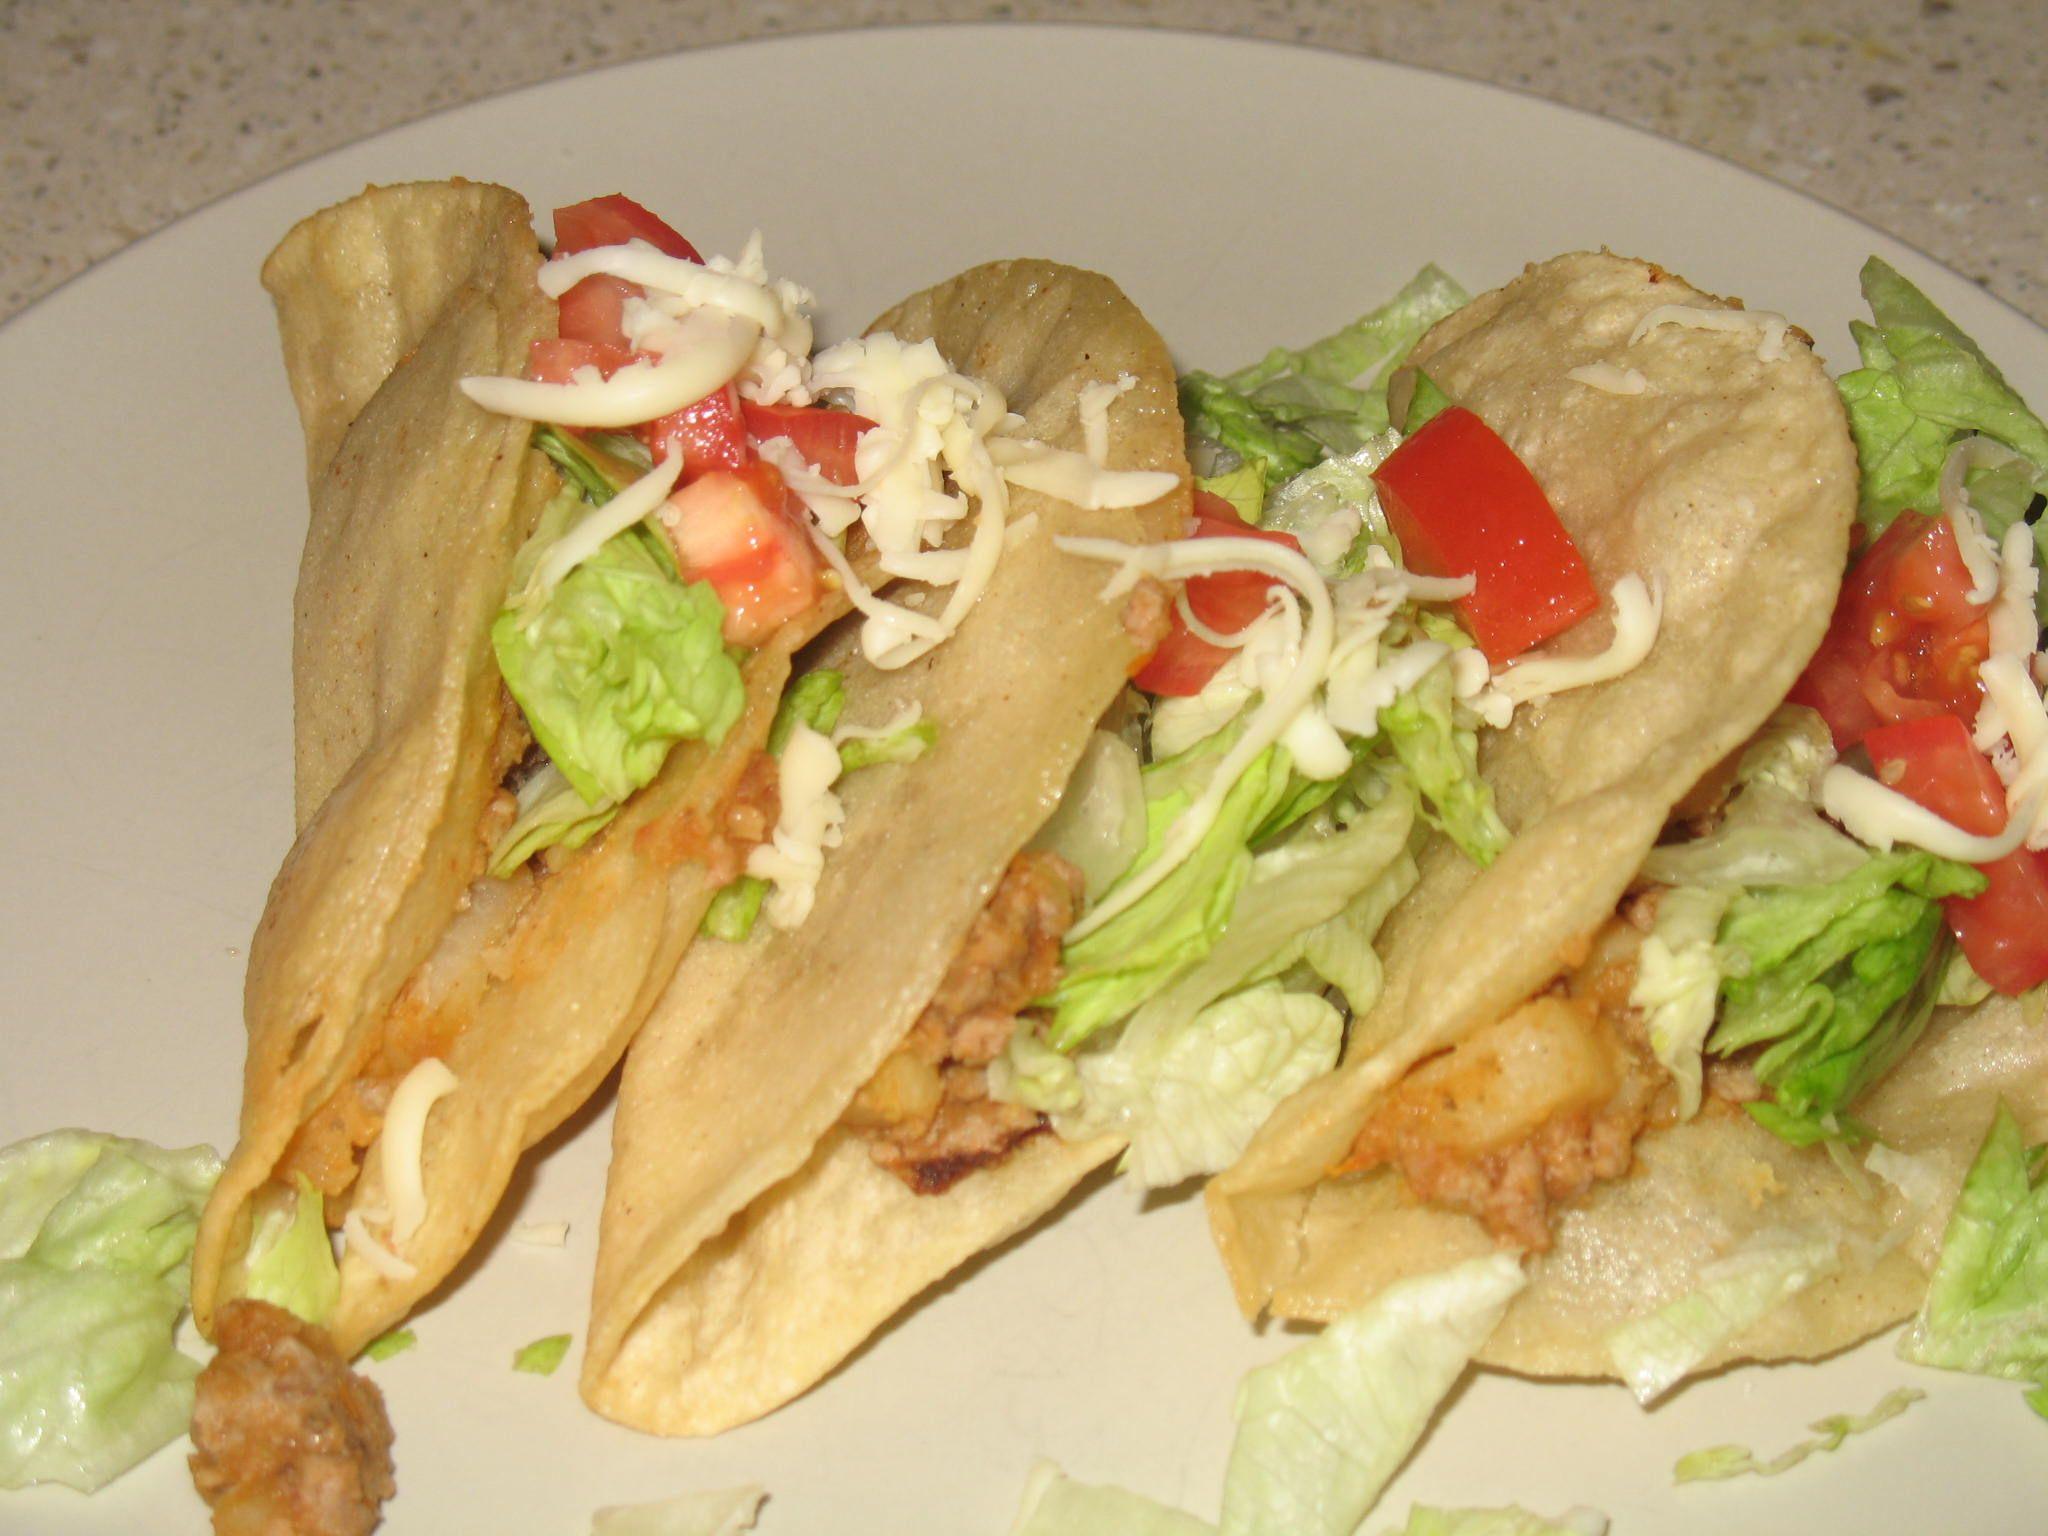 Turkey Picadillo tacos - Mexican style dish using #groundturkey #potato #tomato #mexicanfood #tacos #easycooking #corntortillas http://mykidseatsquid.com/2011/01/turkey-picadillo/